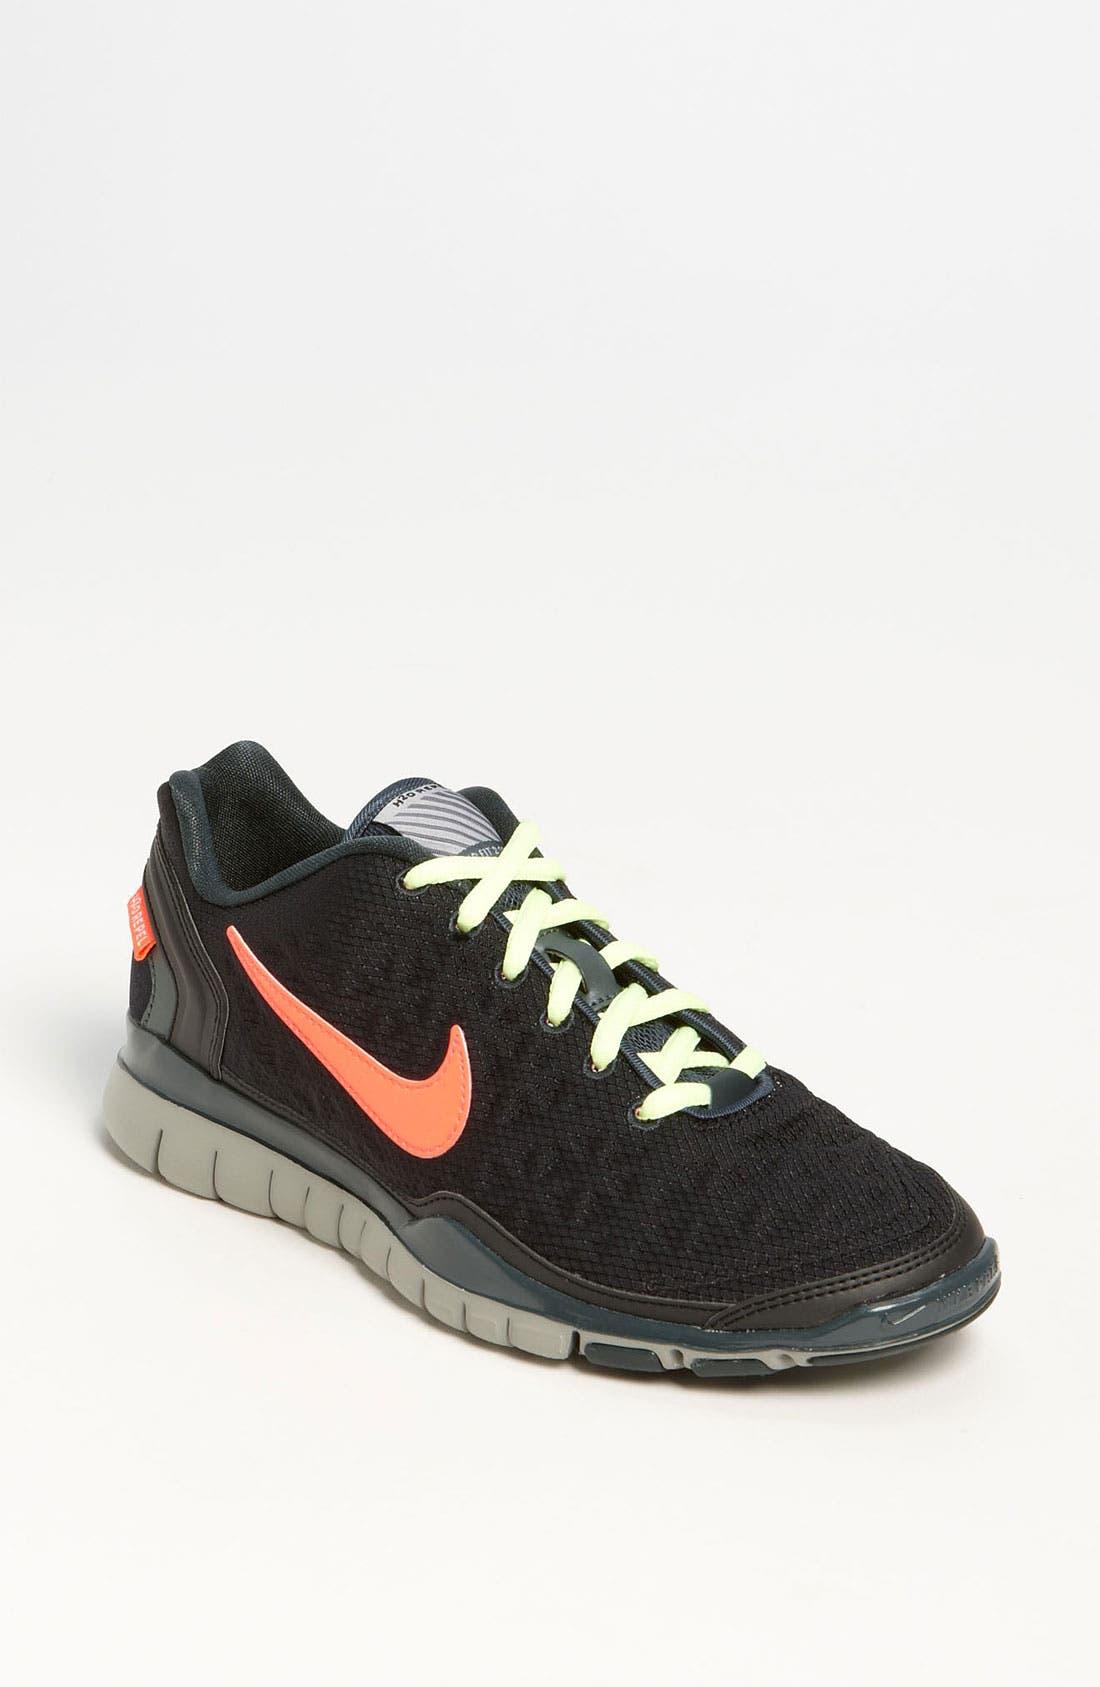 Main Image - Nike 'Free TR Fit 2 Shield' Training Shoe (Women)